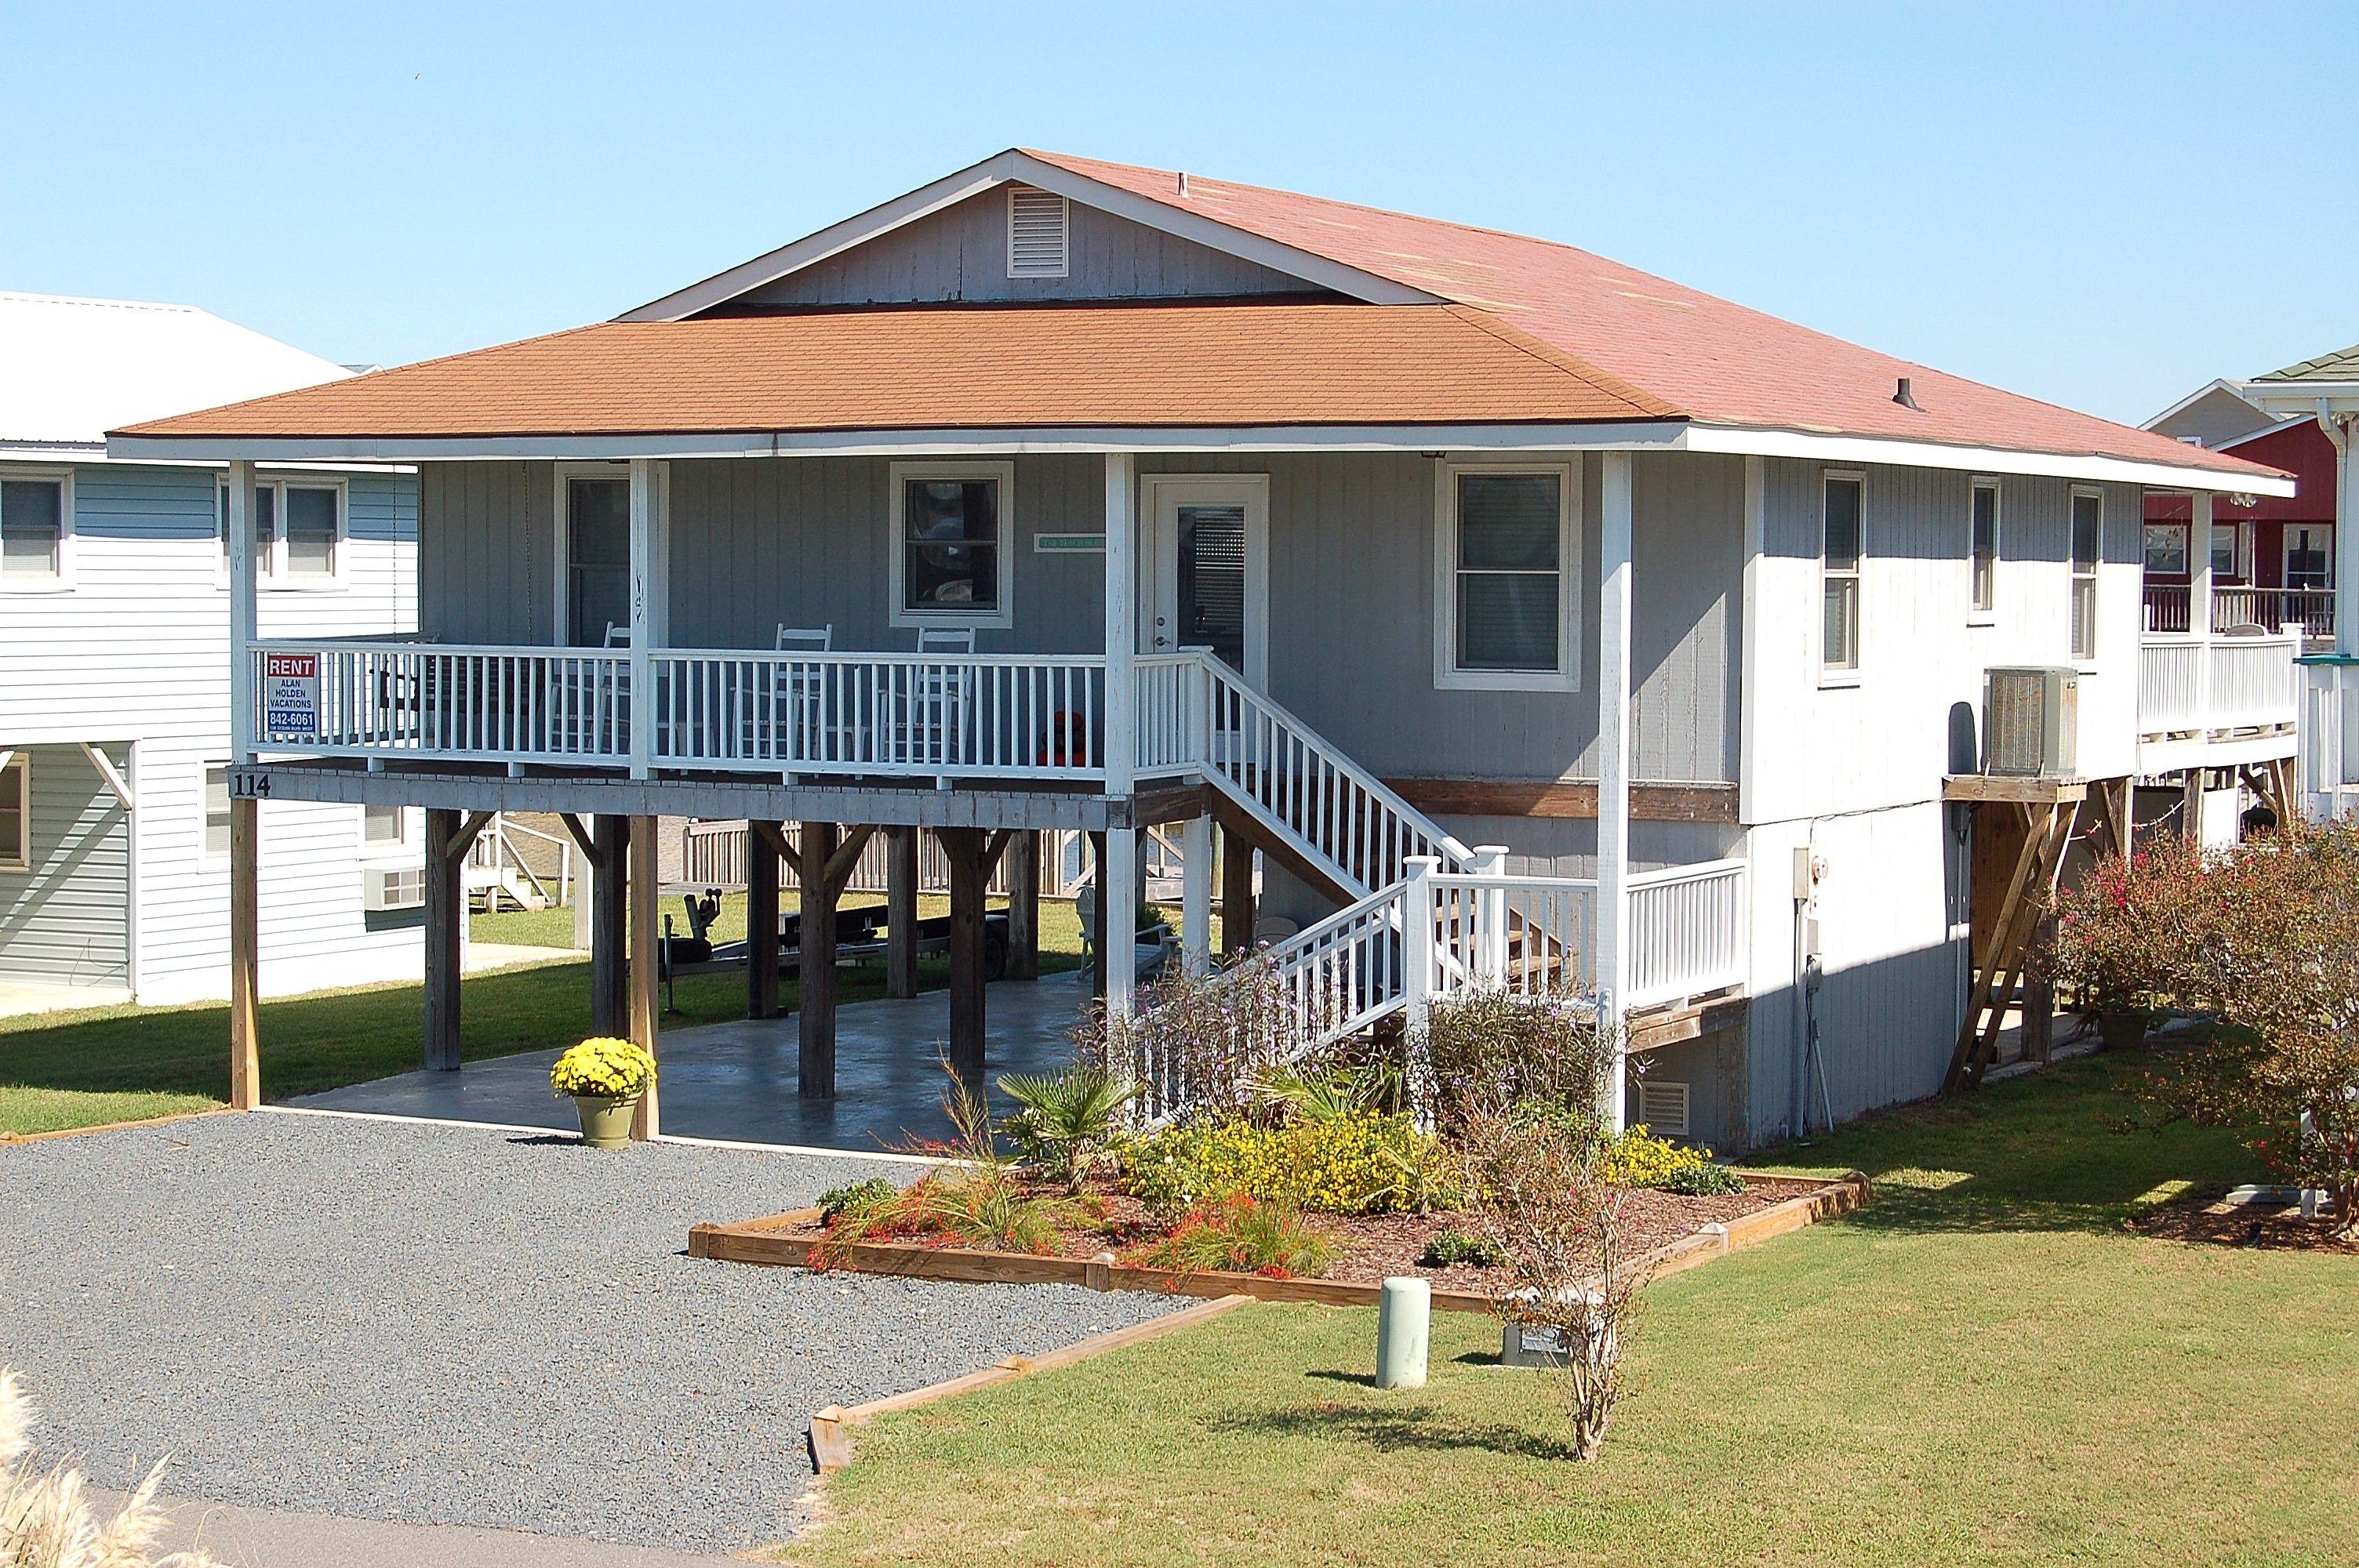 Beach house in 2020 beach house vacation home holden